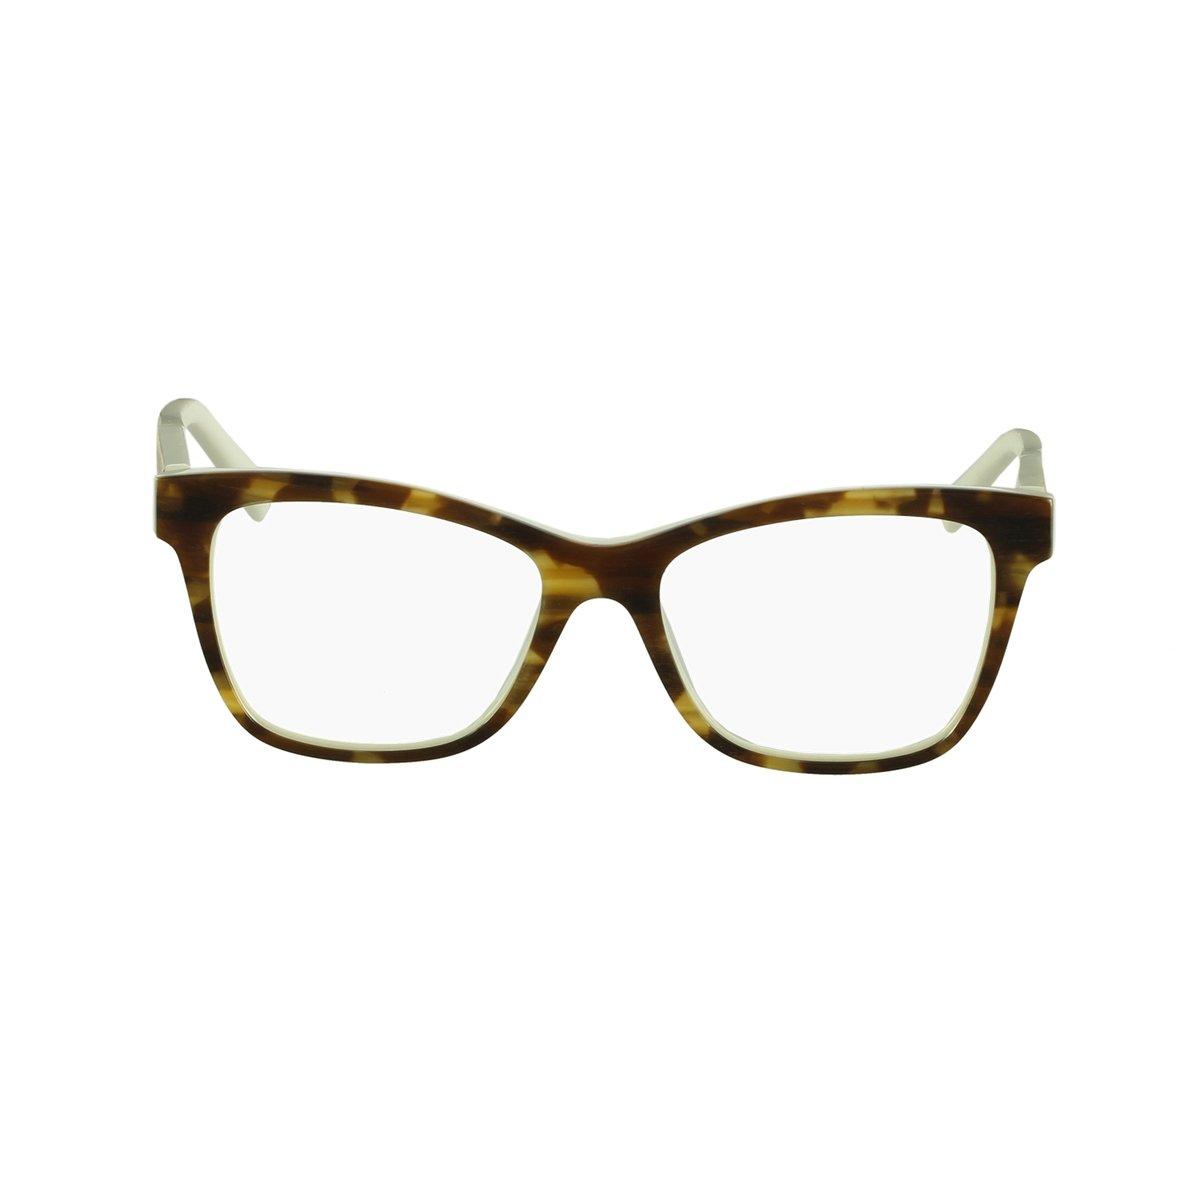 Óculos Ana Hickmann   Netshoes 3efc6fc11a